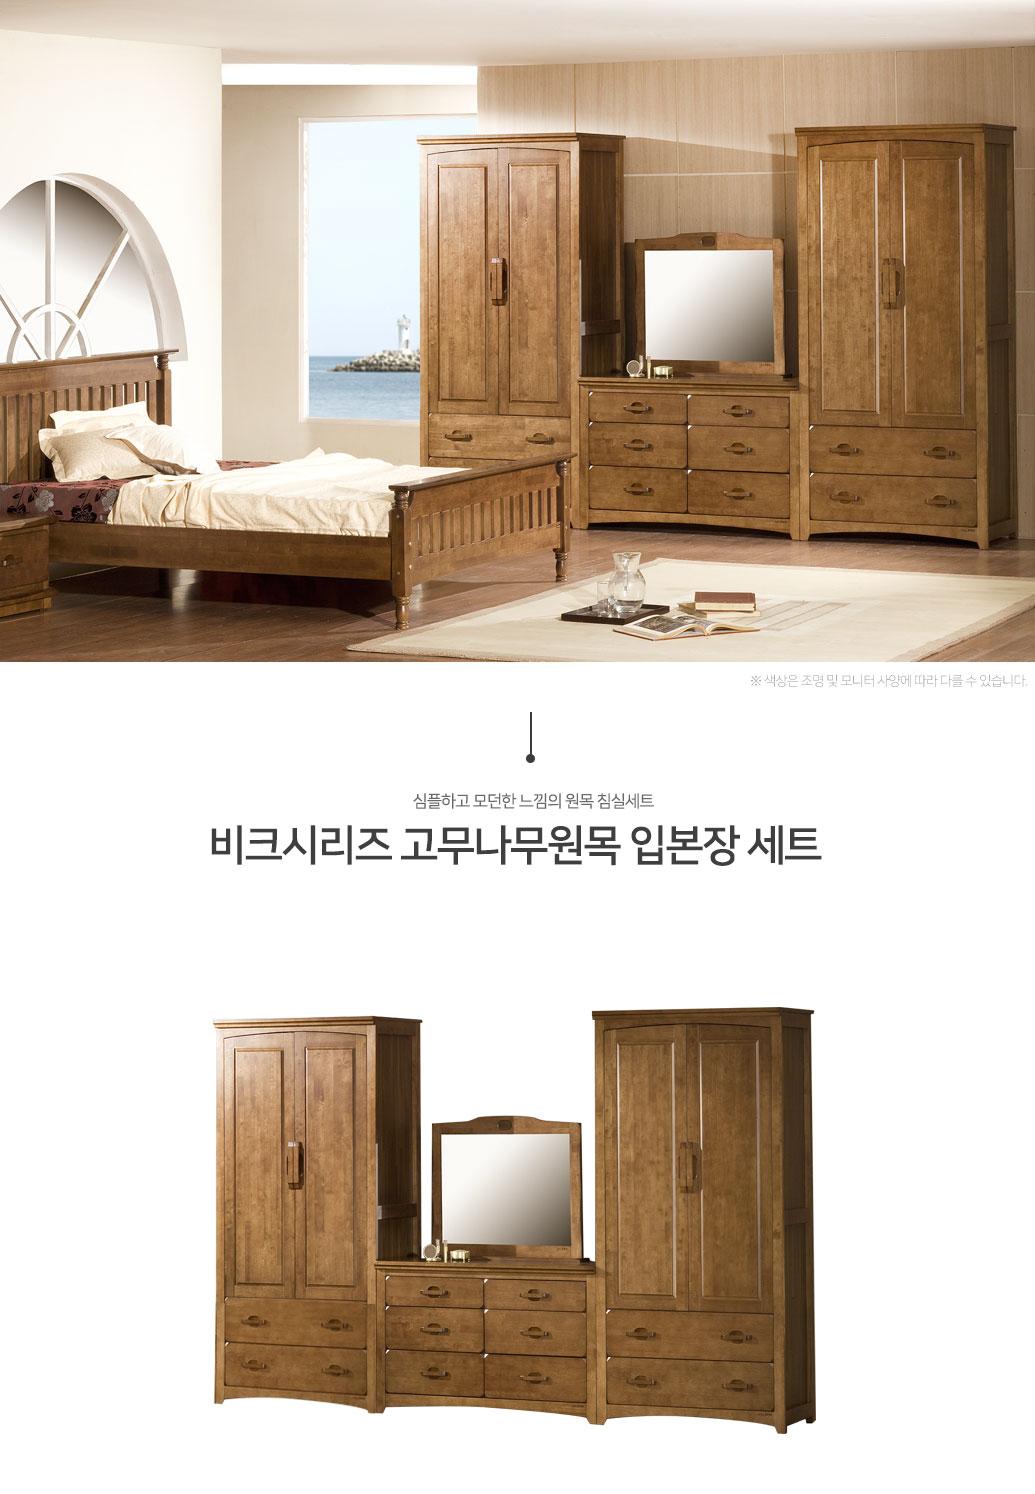 veek_closet2_01.jpg